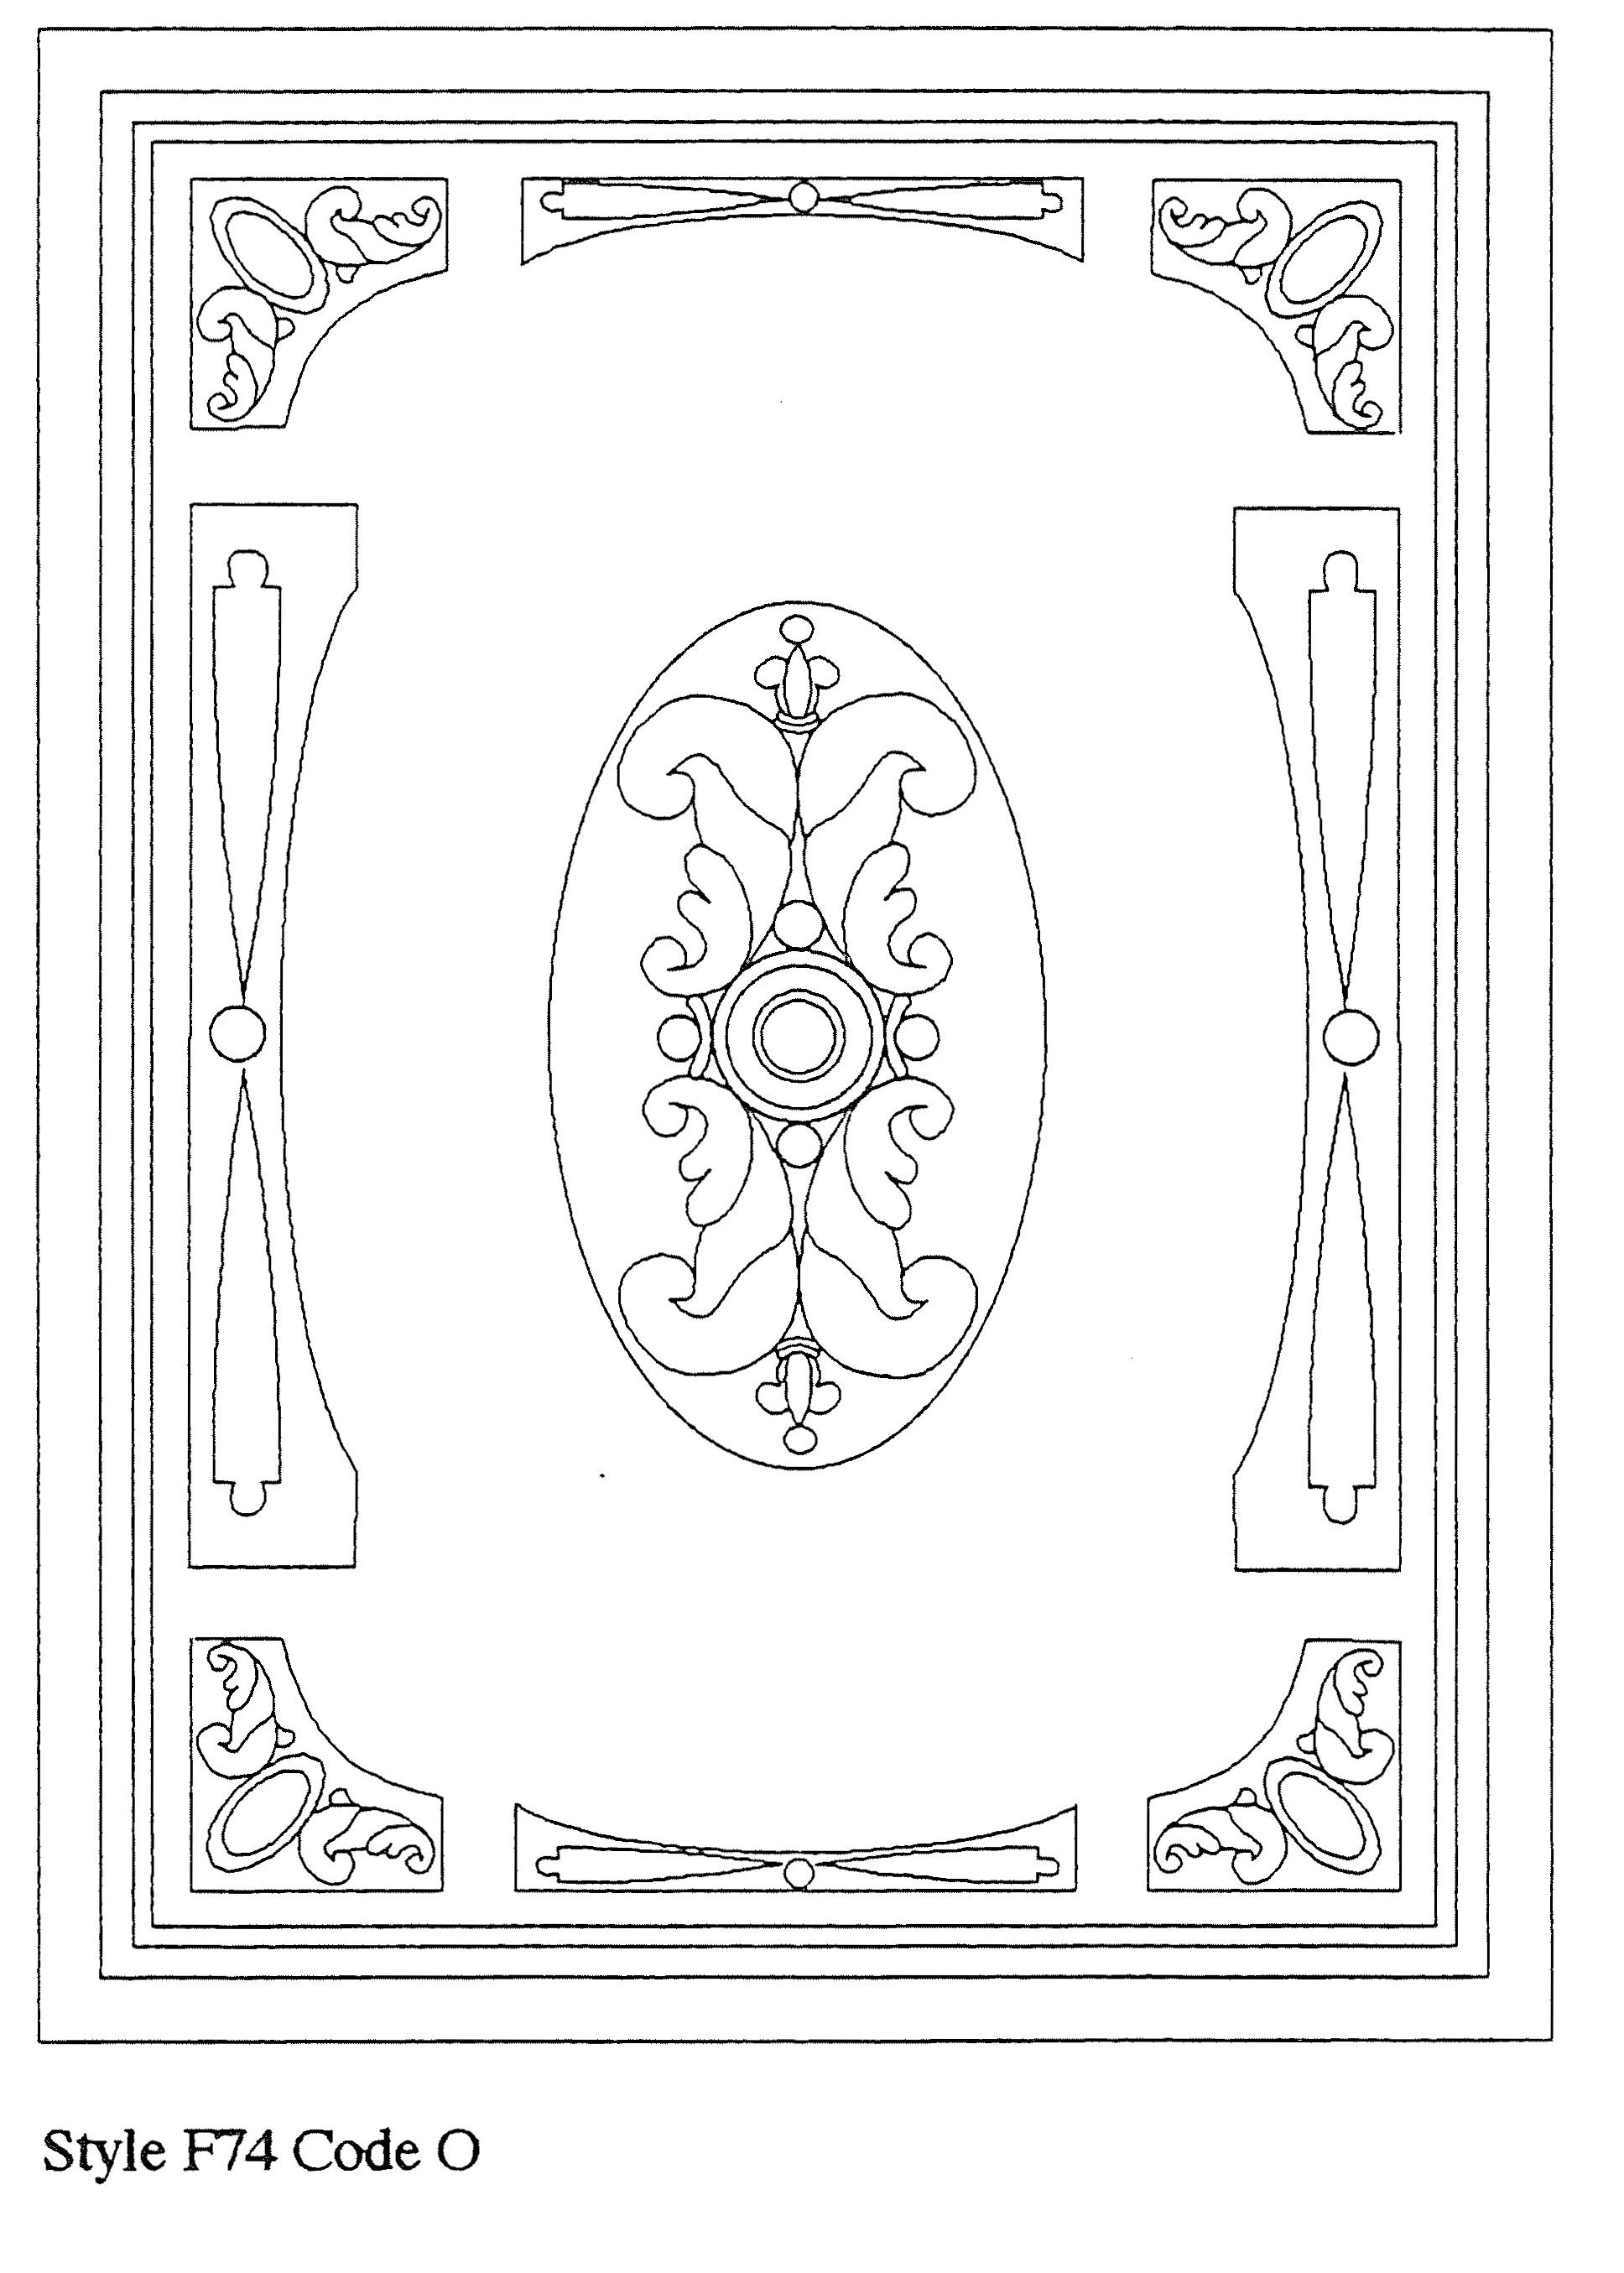 Page 30 copy 3.jpg